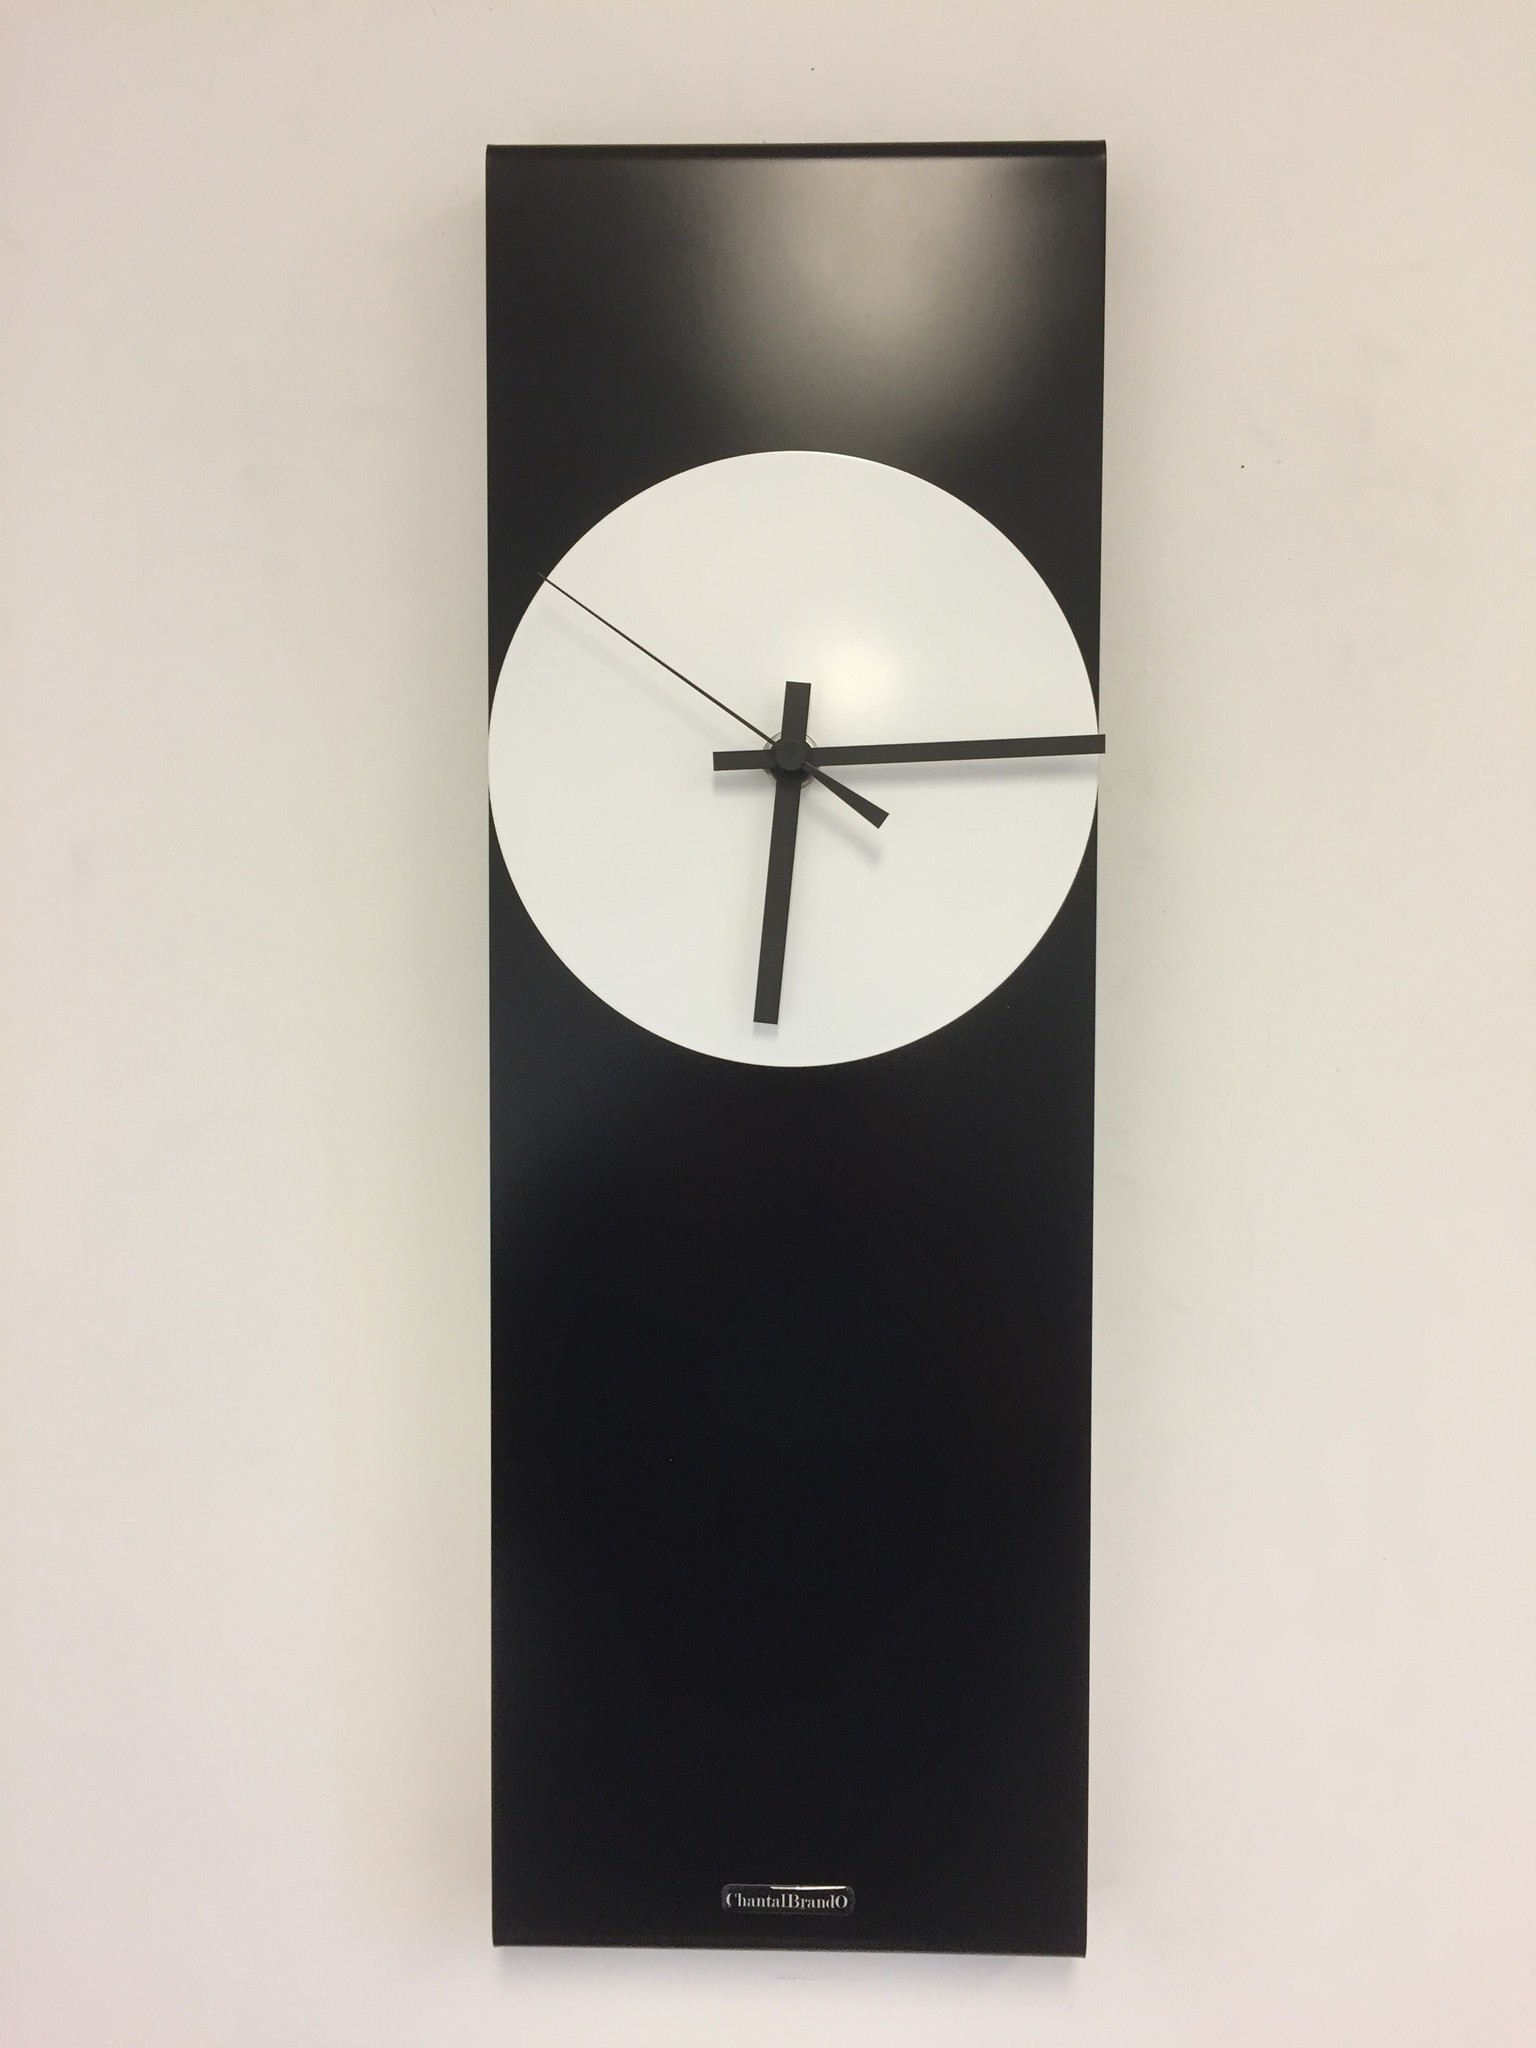 ChantalBrandO Wandklok LaBrand Export Line Black & White Modern Design